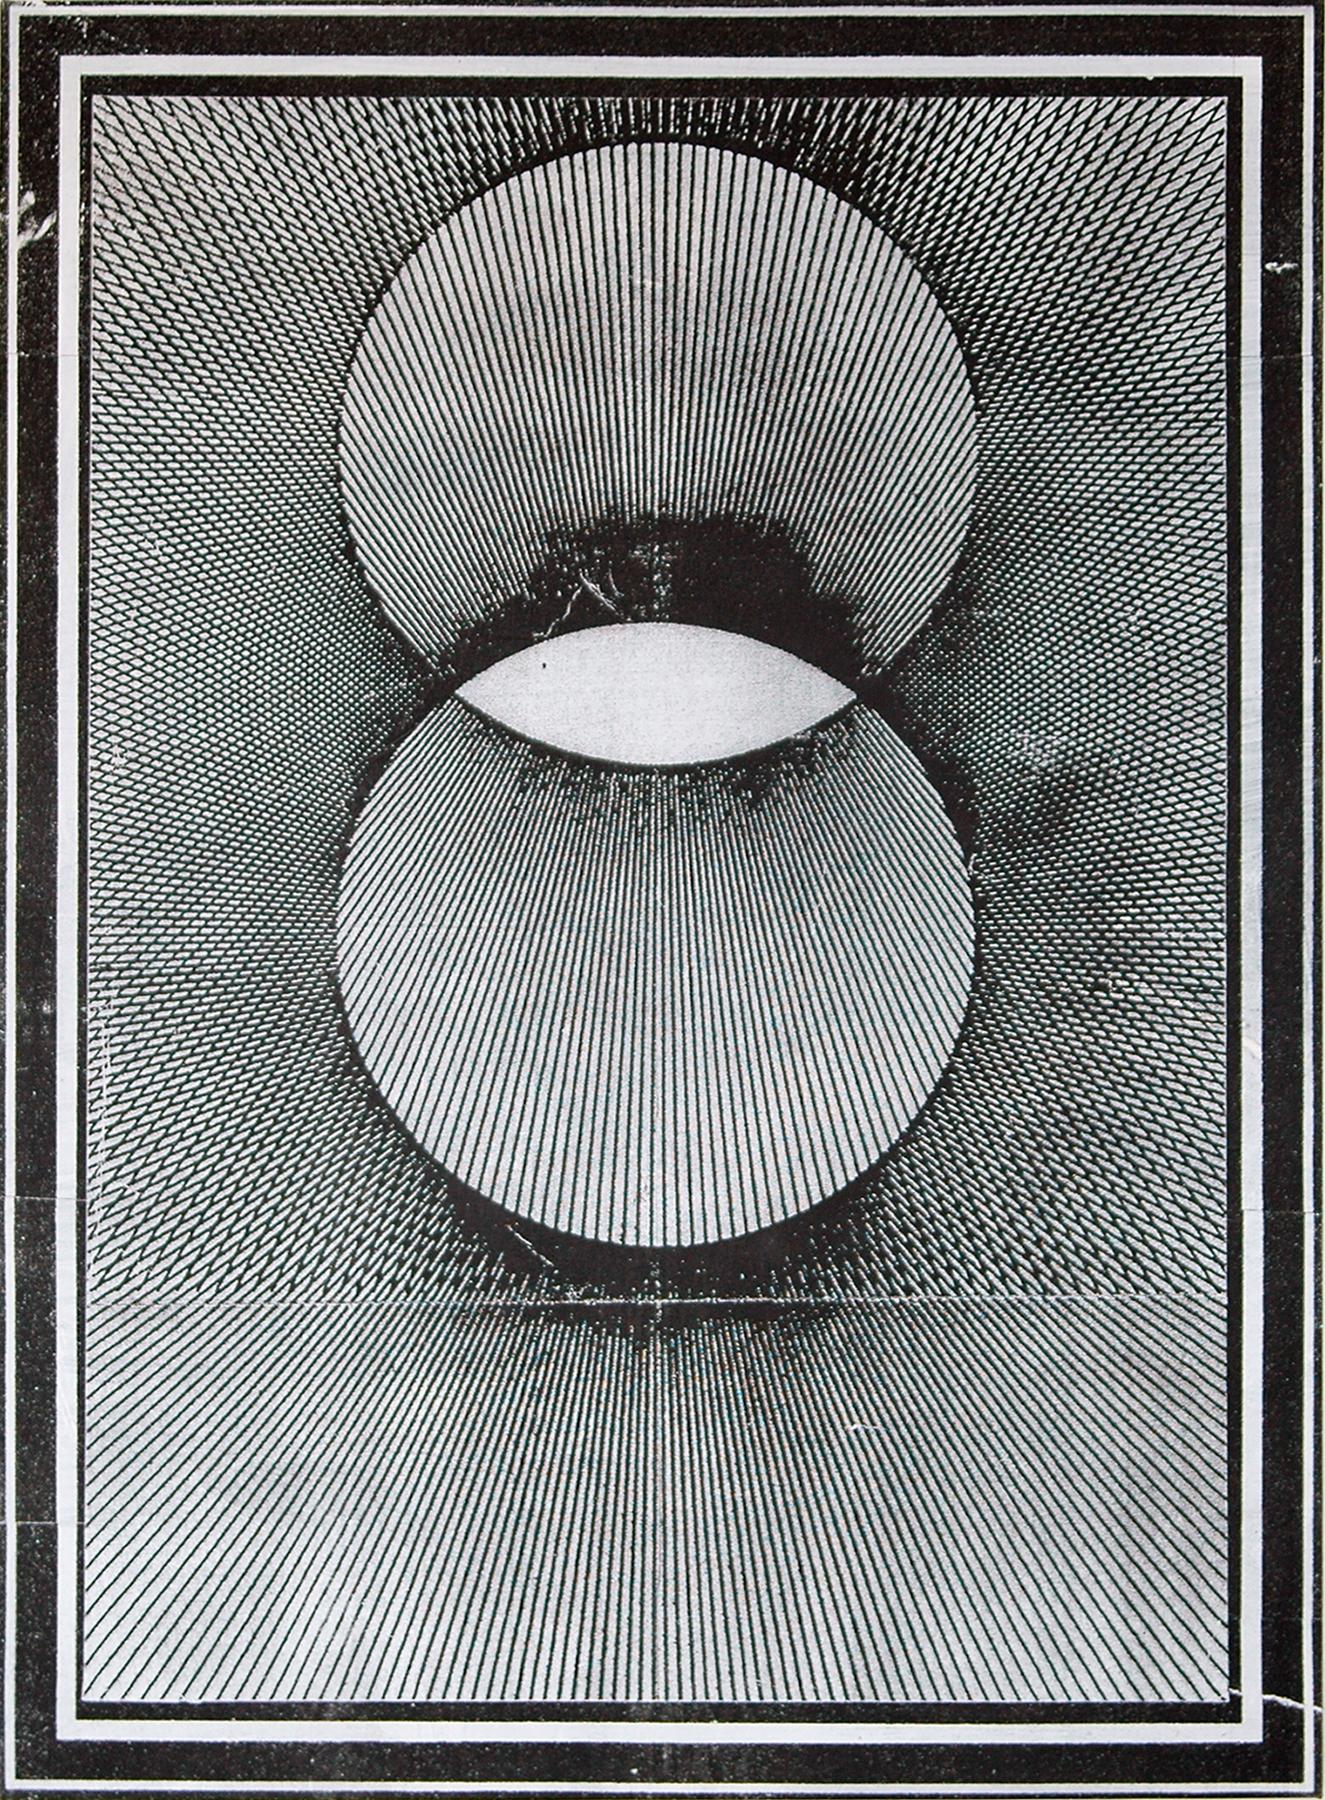 "GWENAËL RATTKE   Projections II (black & white) , 2012, acrylic silkscreen on canvas with hand working, 49"" x 35.5"""